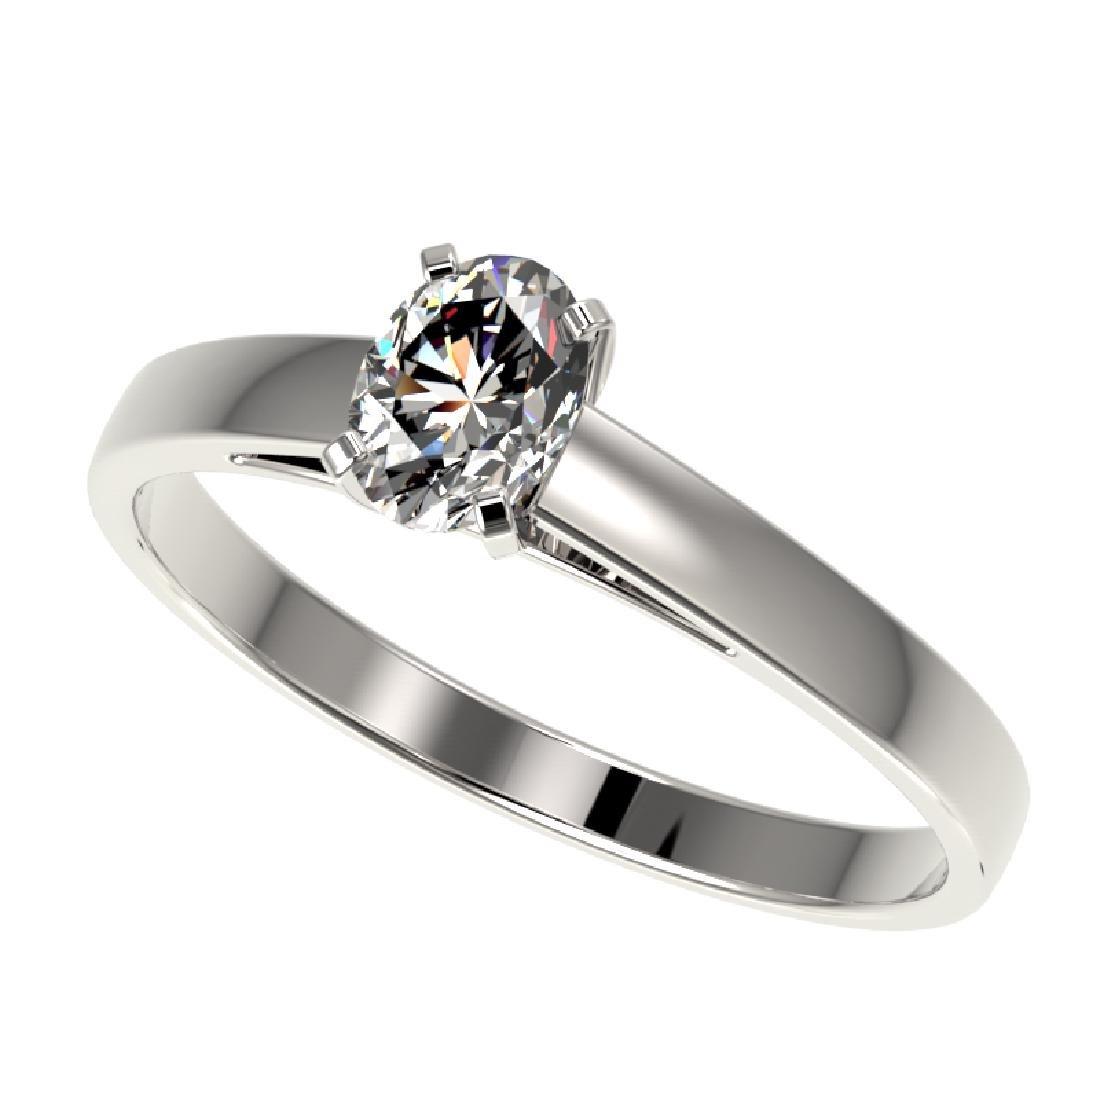 0.50 CTW Certified VS/SI Quality Oval Diamond